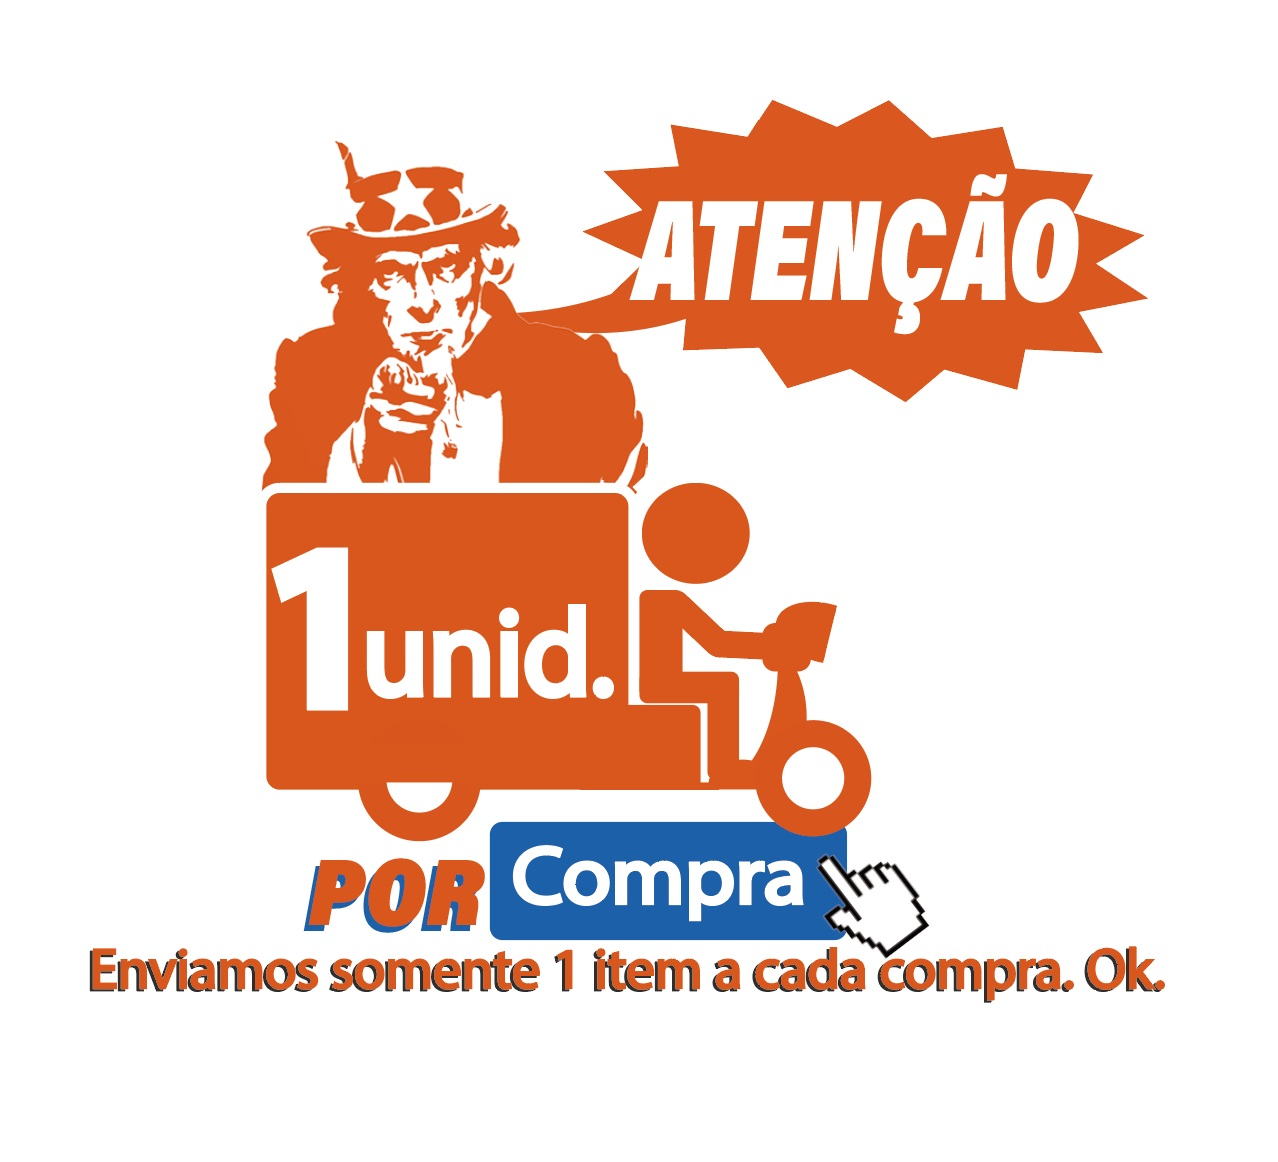 CHECK OUT PRETO 1,30 BILATERAL CAIXA DE SUPERMERCADO  + PERFIL COLORIDO   - EKENOX- Equipamentos Industriais